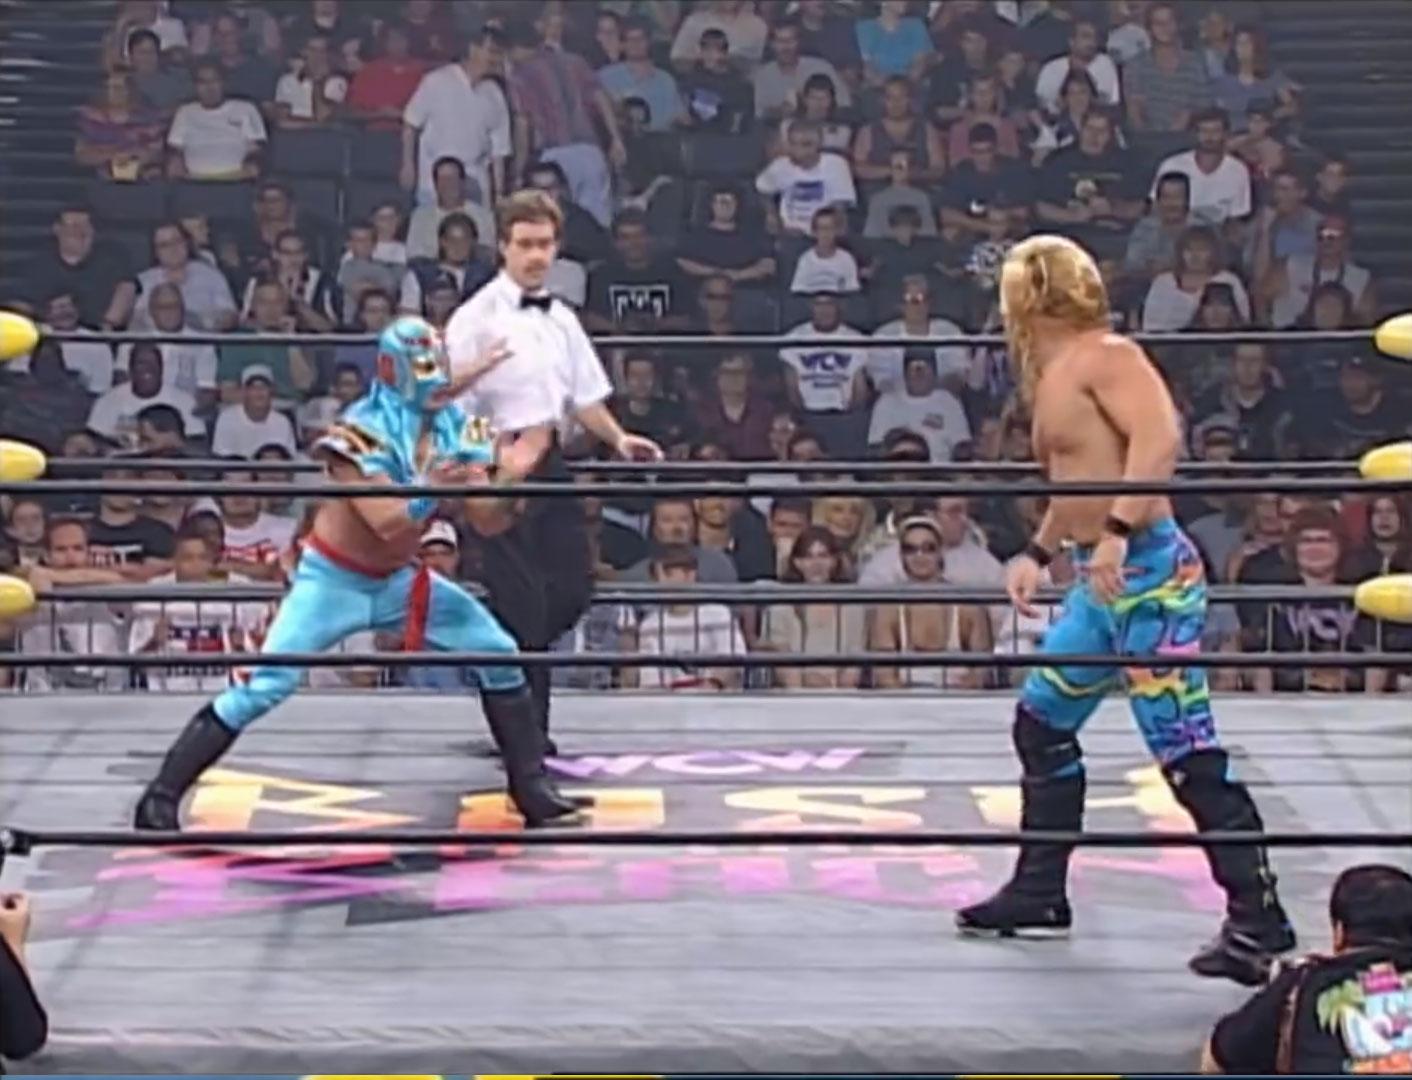 Chris Jericho vs. Ultimo Dragon WCW Cruiserweight Championship, WCW Bash at the Beach '97 Jul 13th 1997